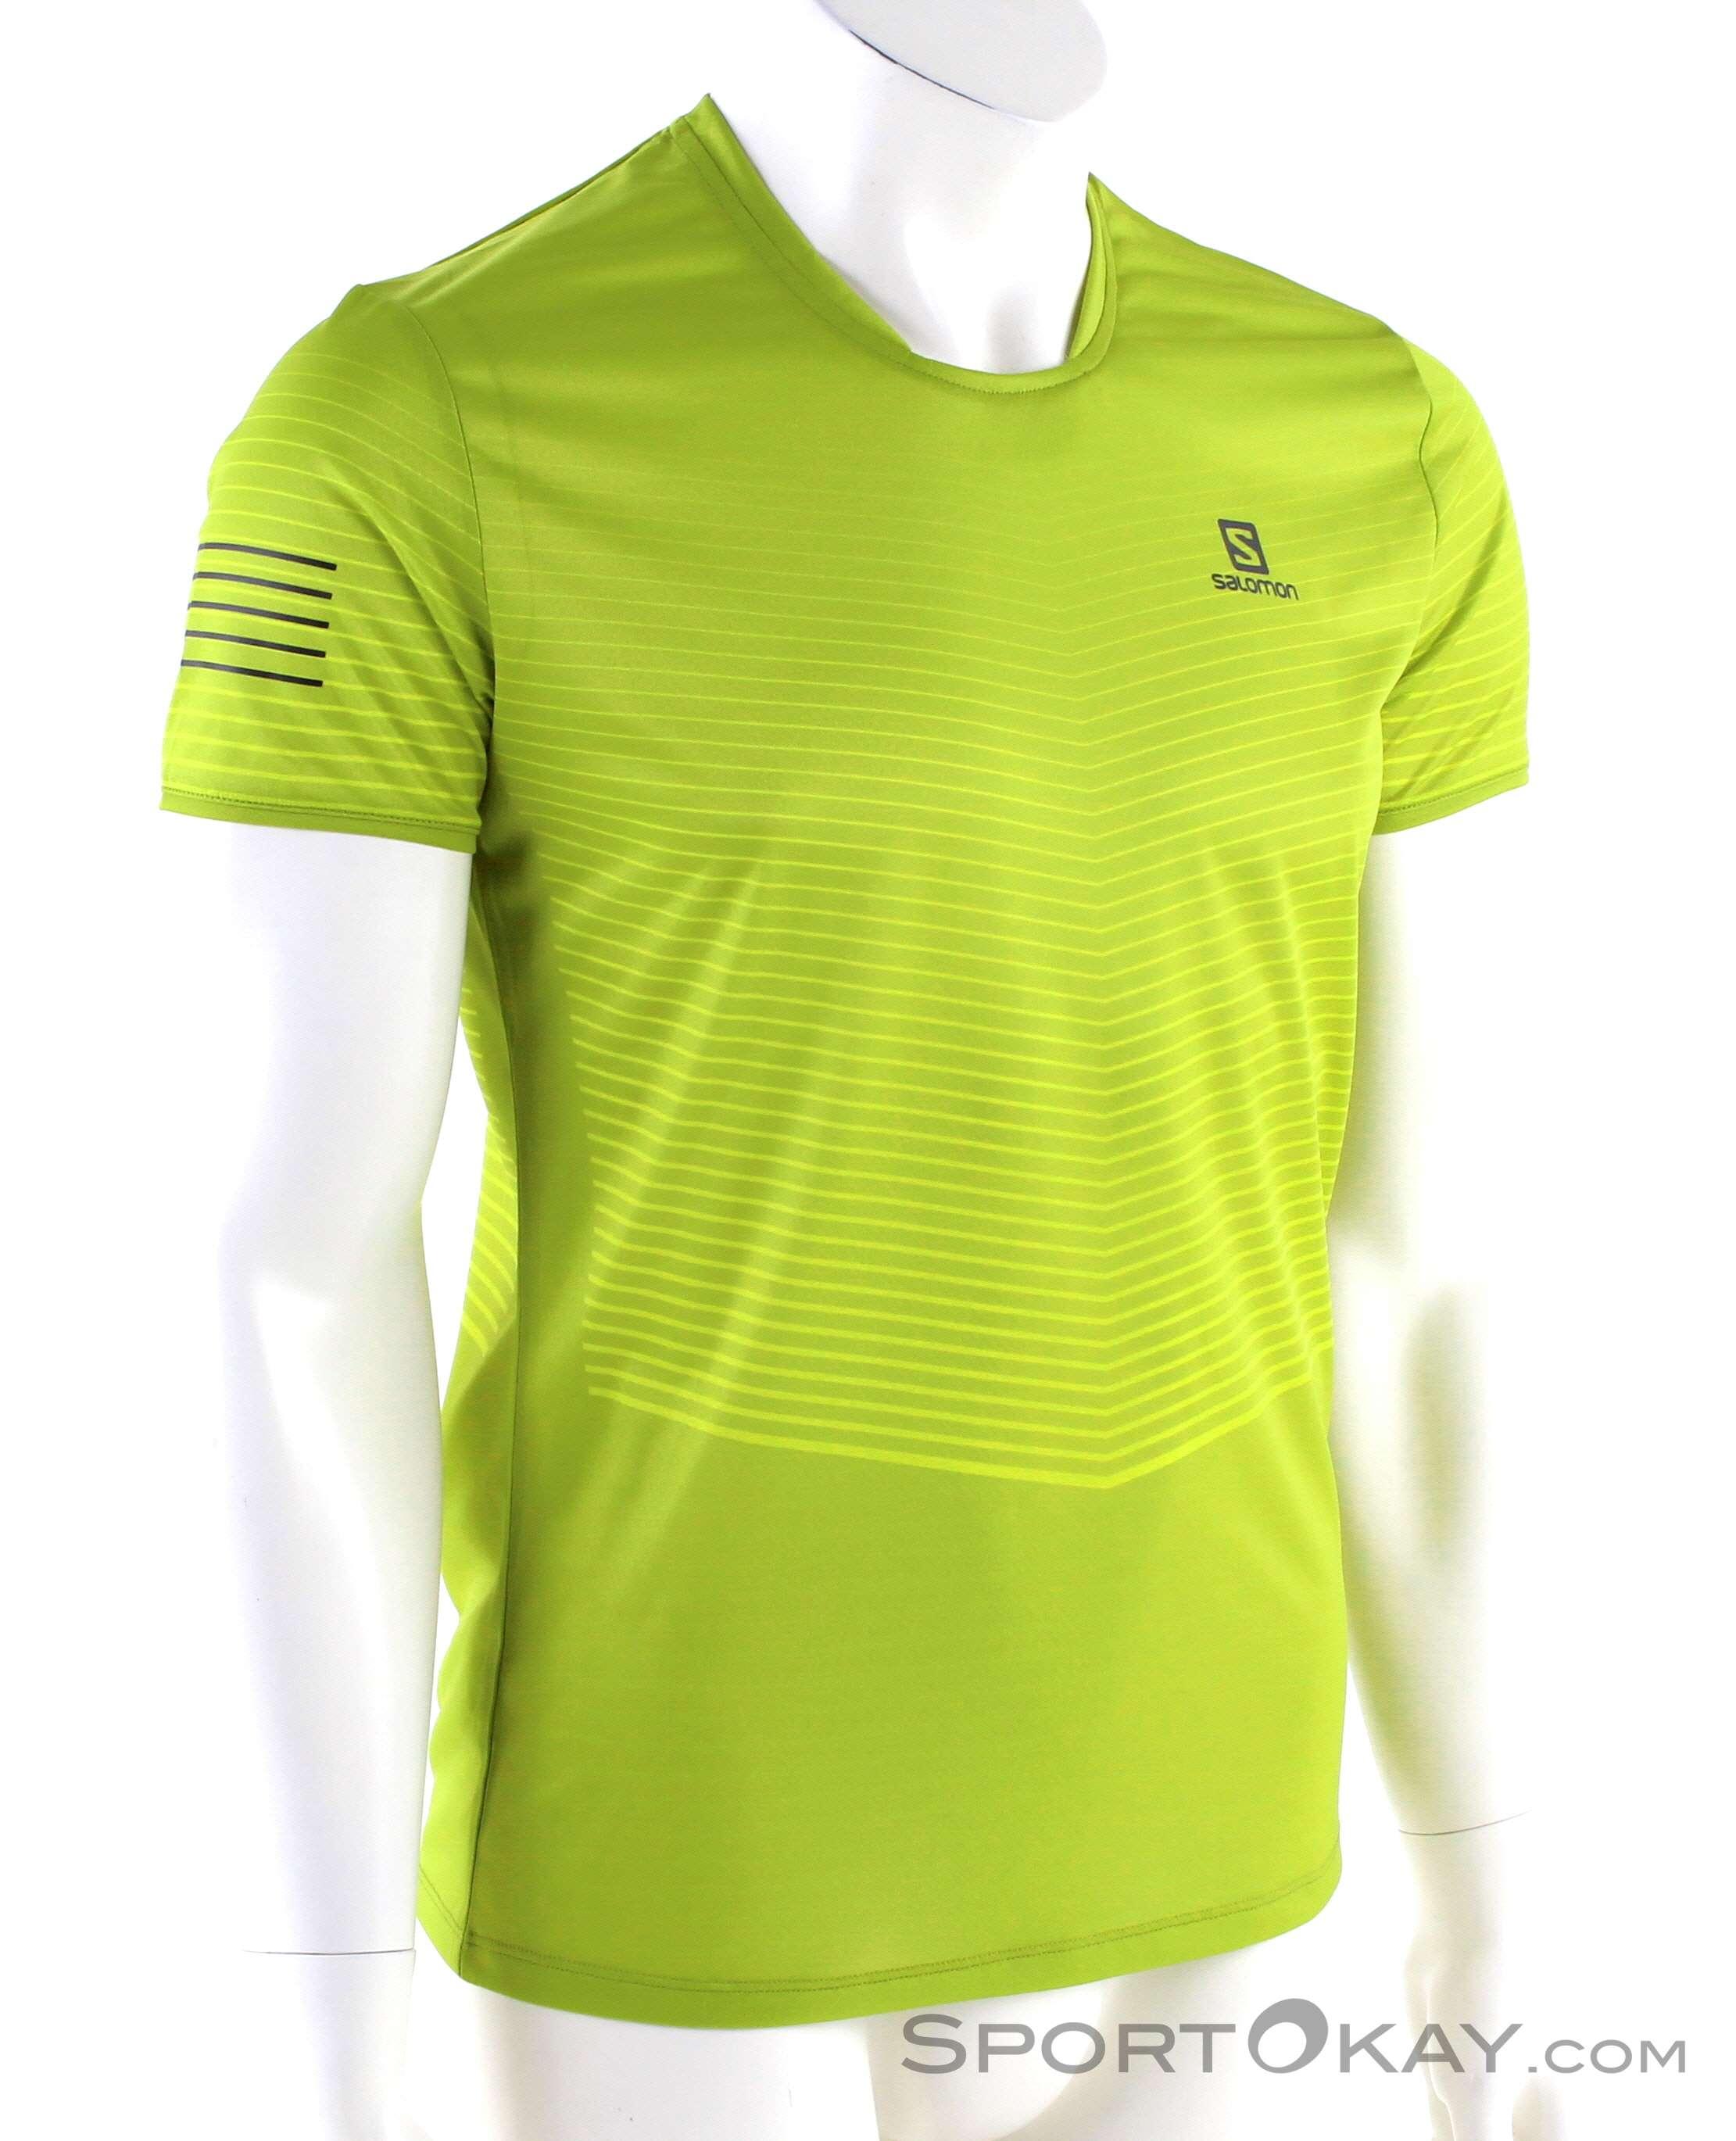 Salomon Sense Tee Mens T Shirt Shirts & T Shirts Fitness